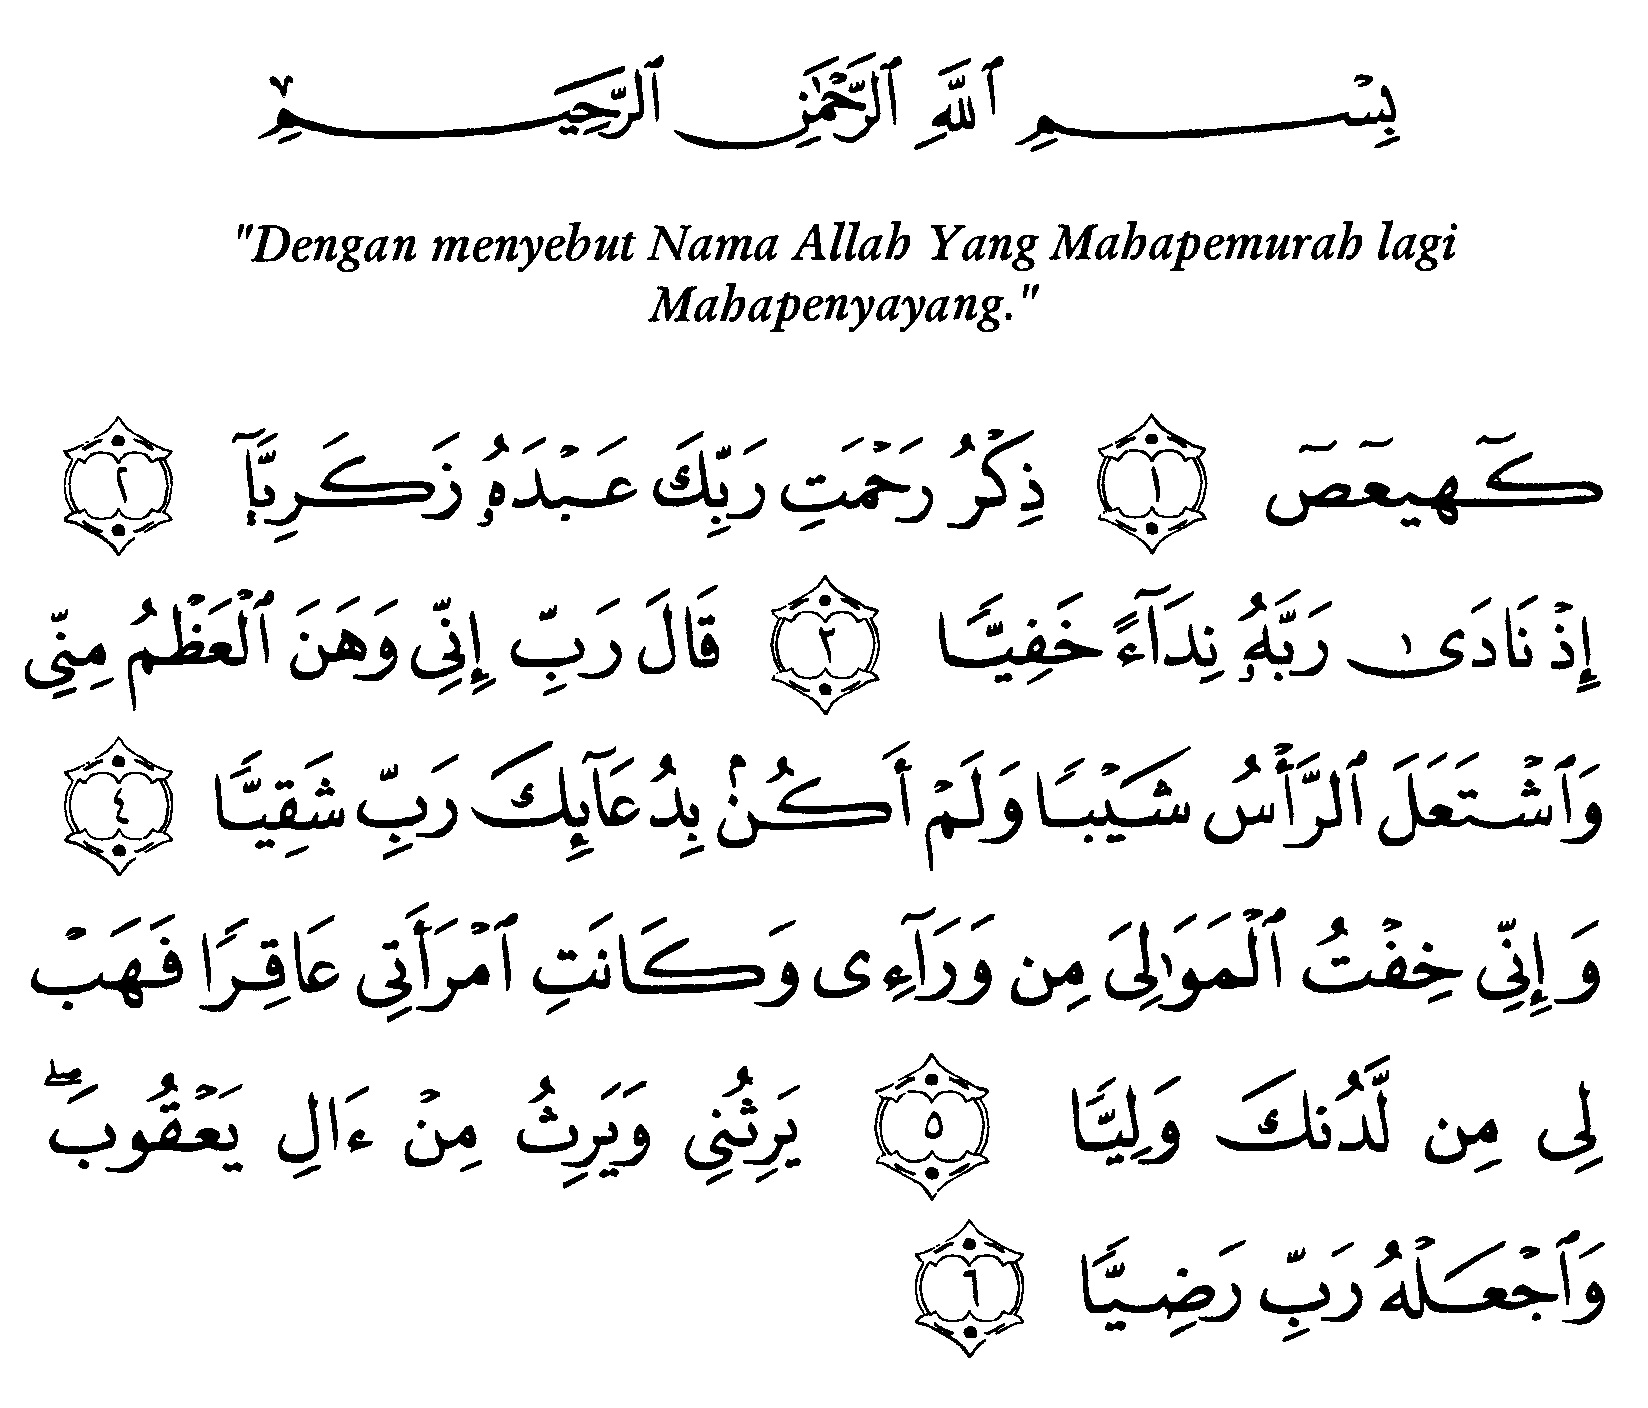 Tafsir Ibnu Katsir Surah Maryam Ayat 1 6 Alquranmulia